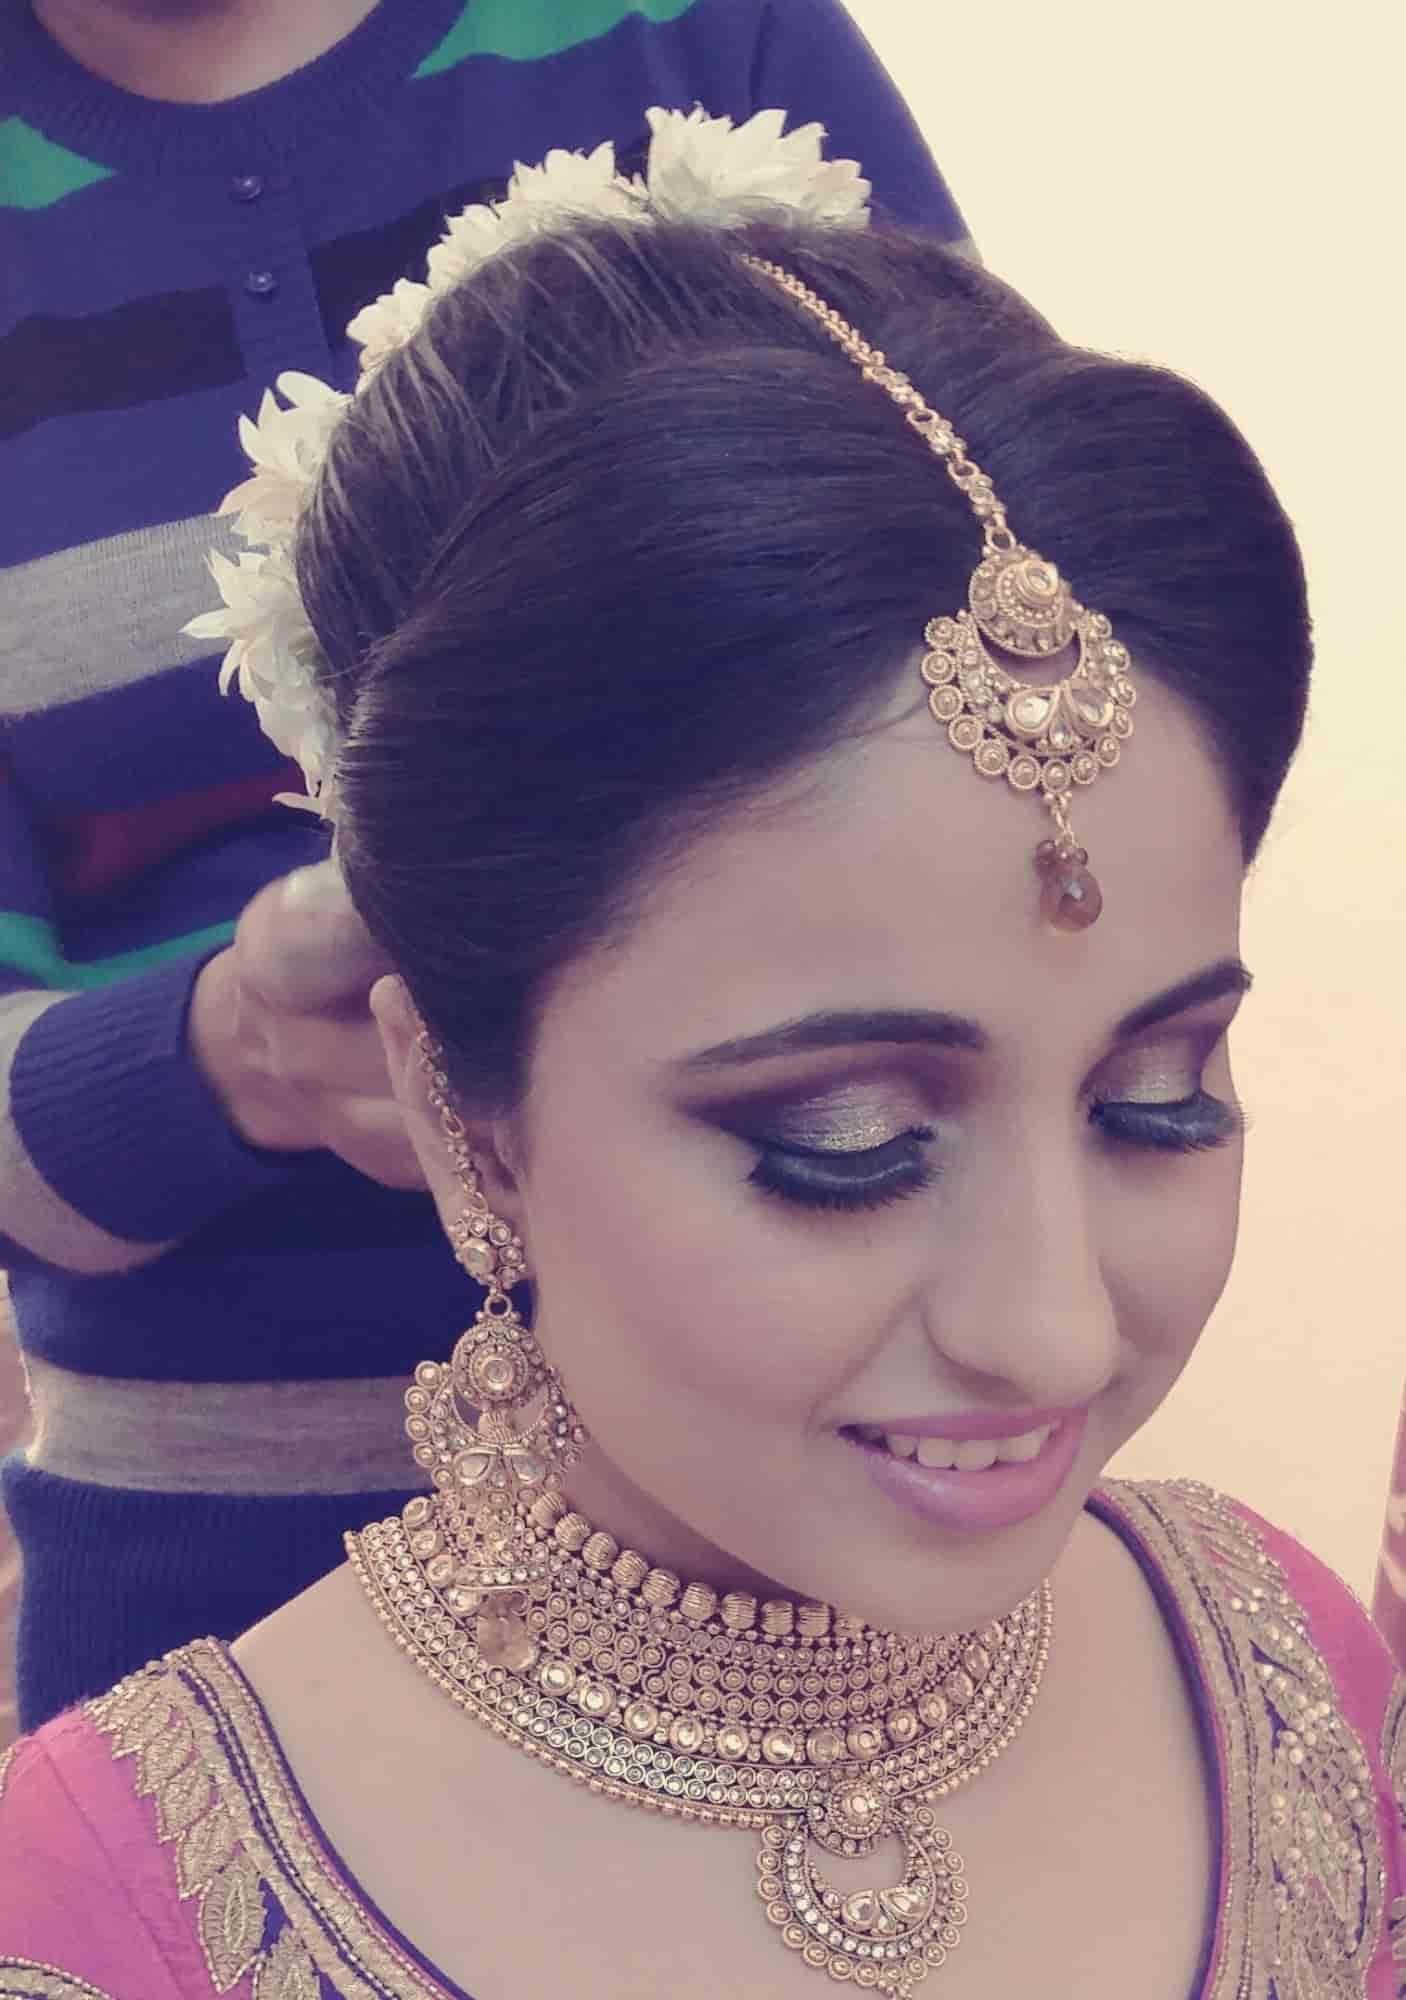 ... Best Bridal Makeup Artist Poonam Rawat Photos, Vasant Kunj, Delhi - Makeup Artists ...